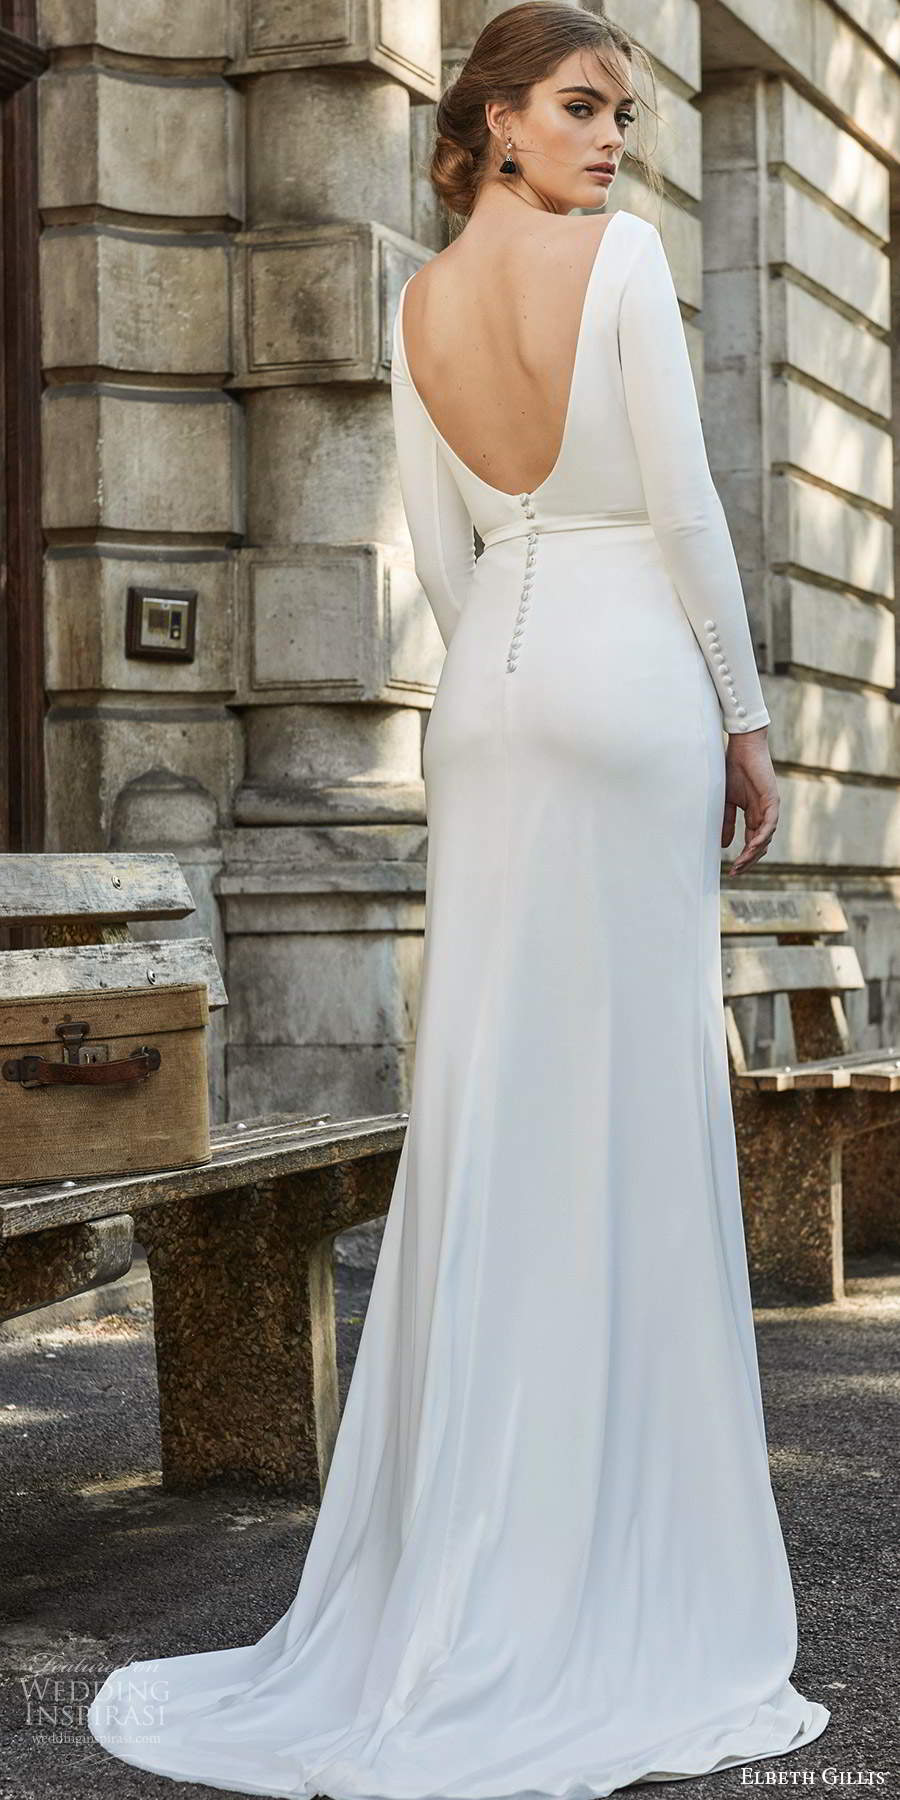 elbeth gillis 2021 bridal long sleeves bateau neckline clean minimalist sheath wedding dress scoop back sweep train (1) bv